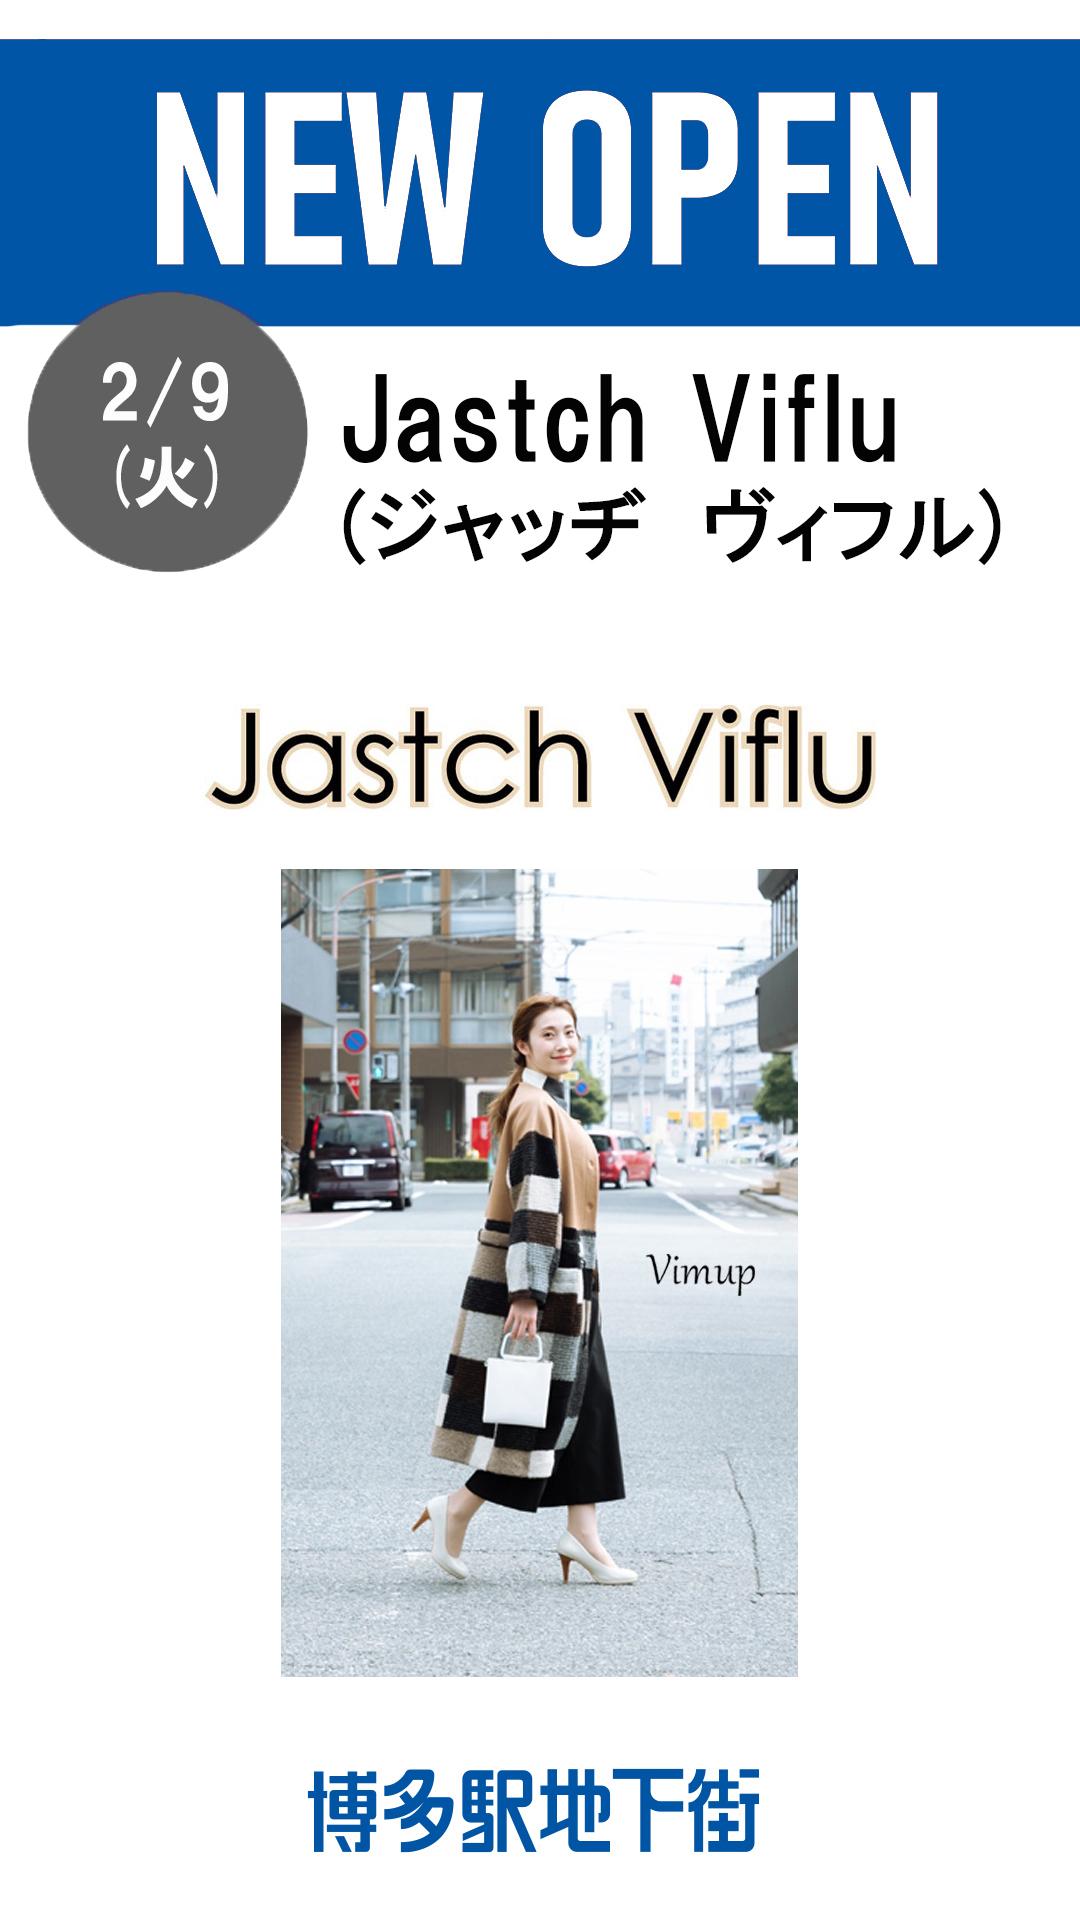 Jastch-Viflu-open